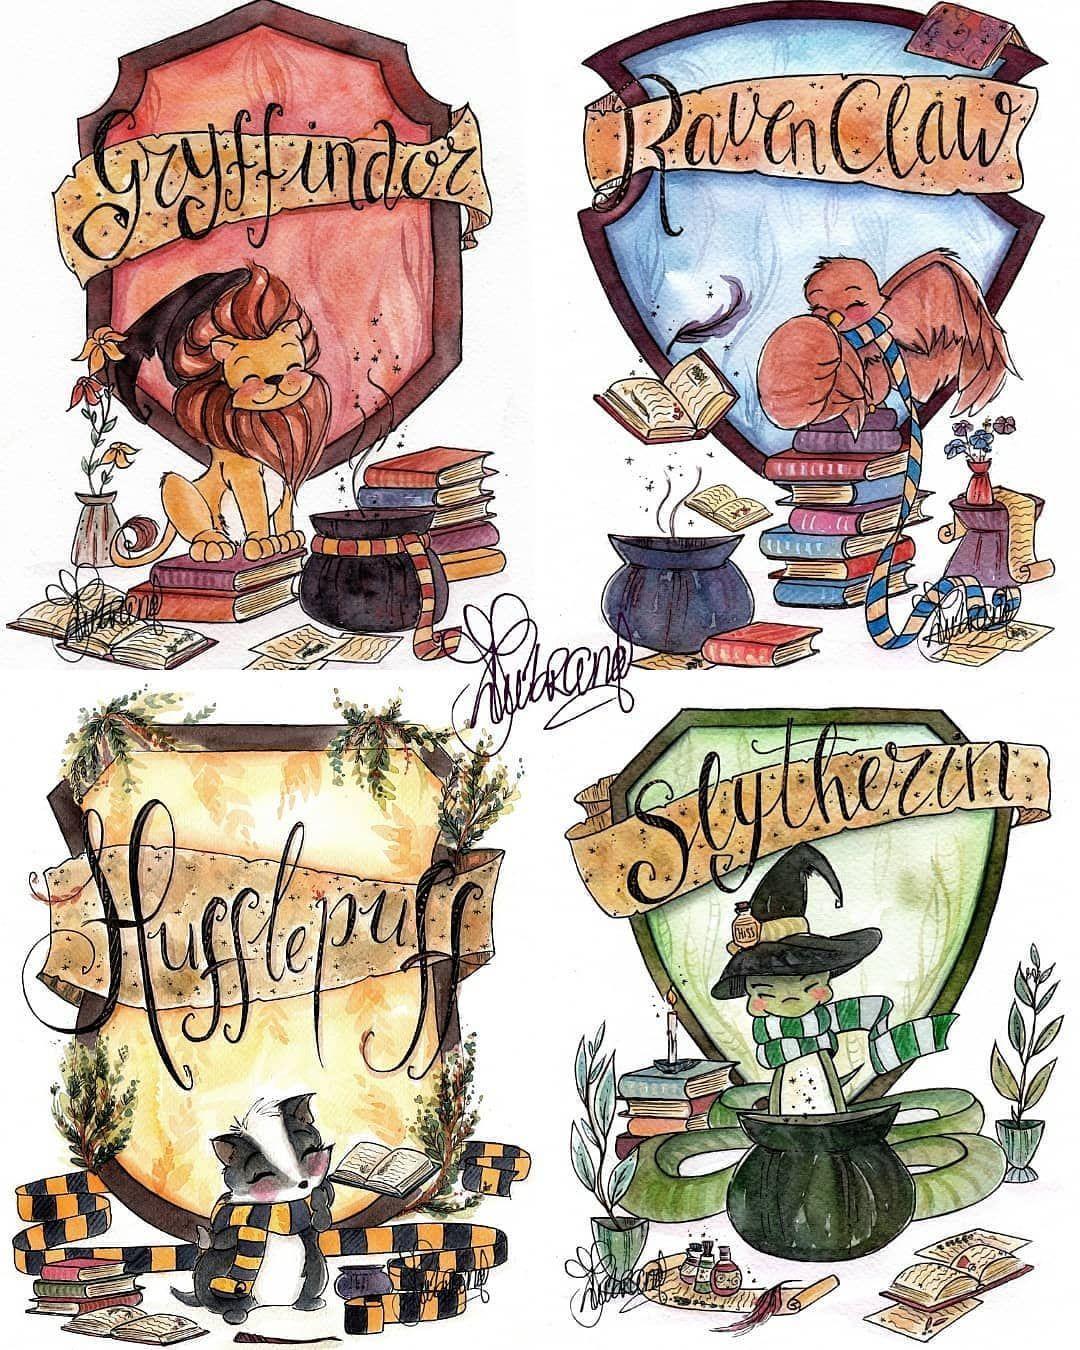 Tj Lubrano Illustrator On Instagram Quick Update Again Tj Lubrano Il Harry Potter Illustrations Harry Potter Background Harry Potter Drawings